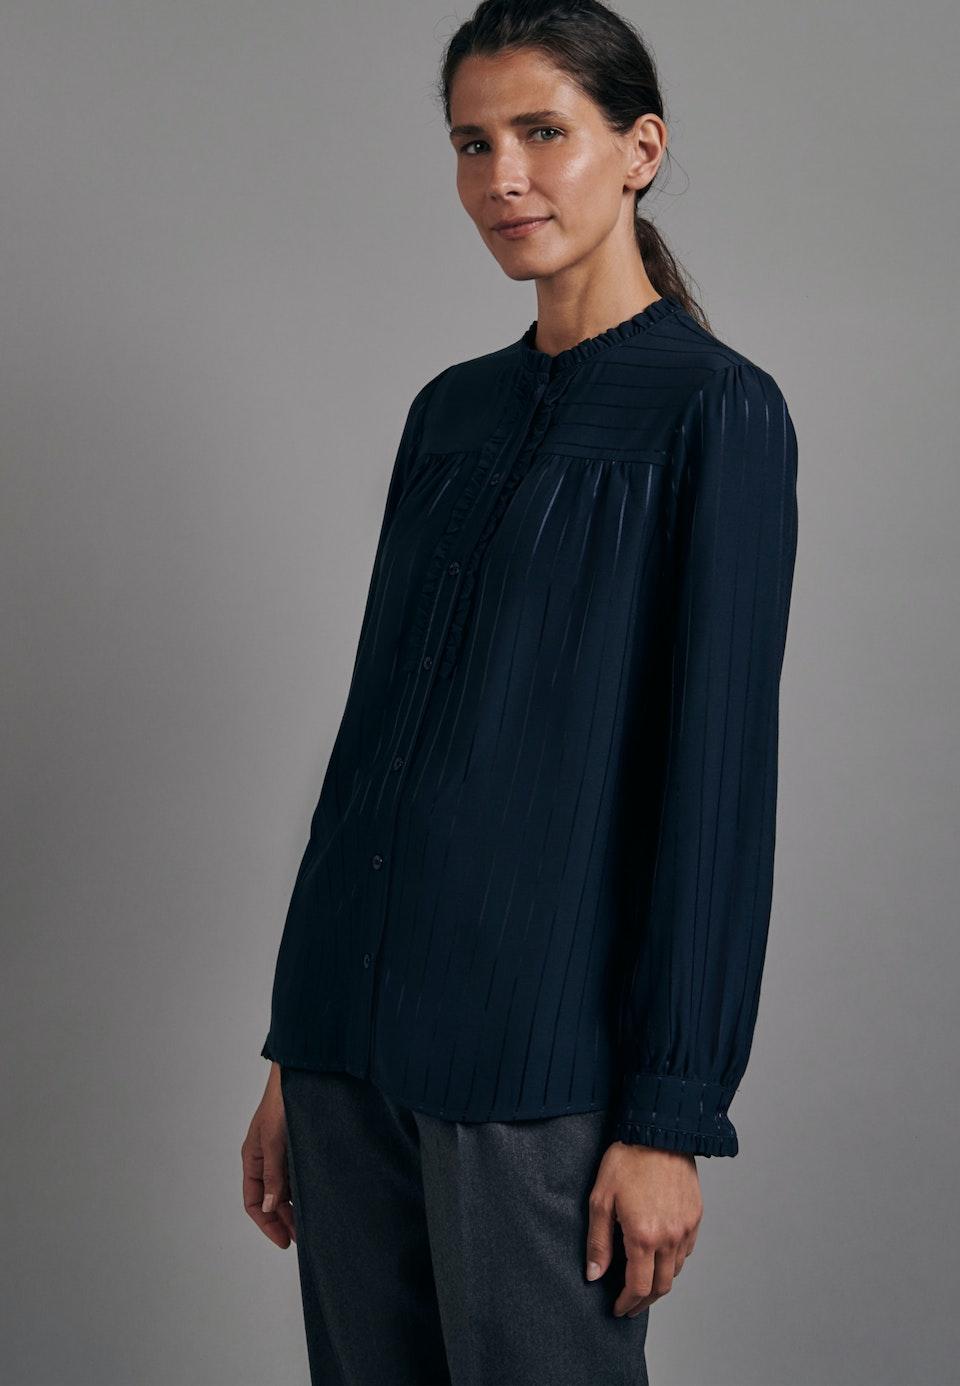 Satin Stand-Up Blouse made of viscose blend in Dark blue |  Seidensticker Onlineshop